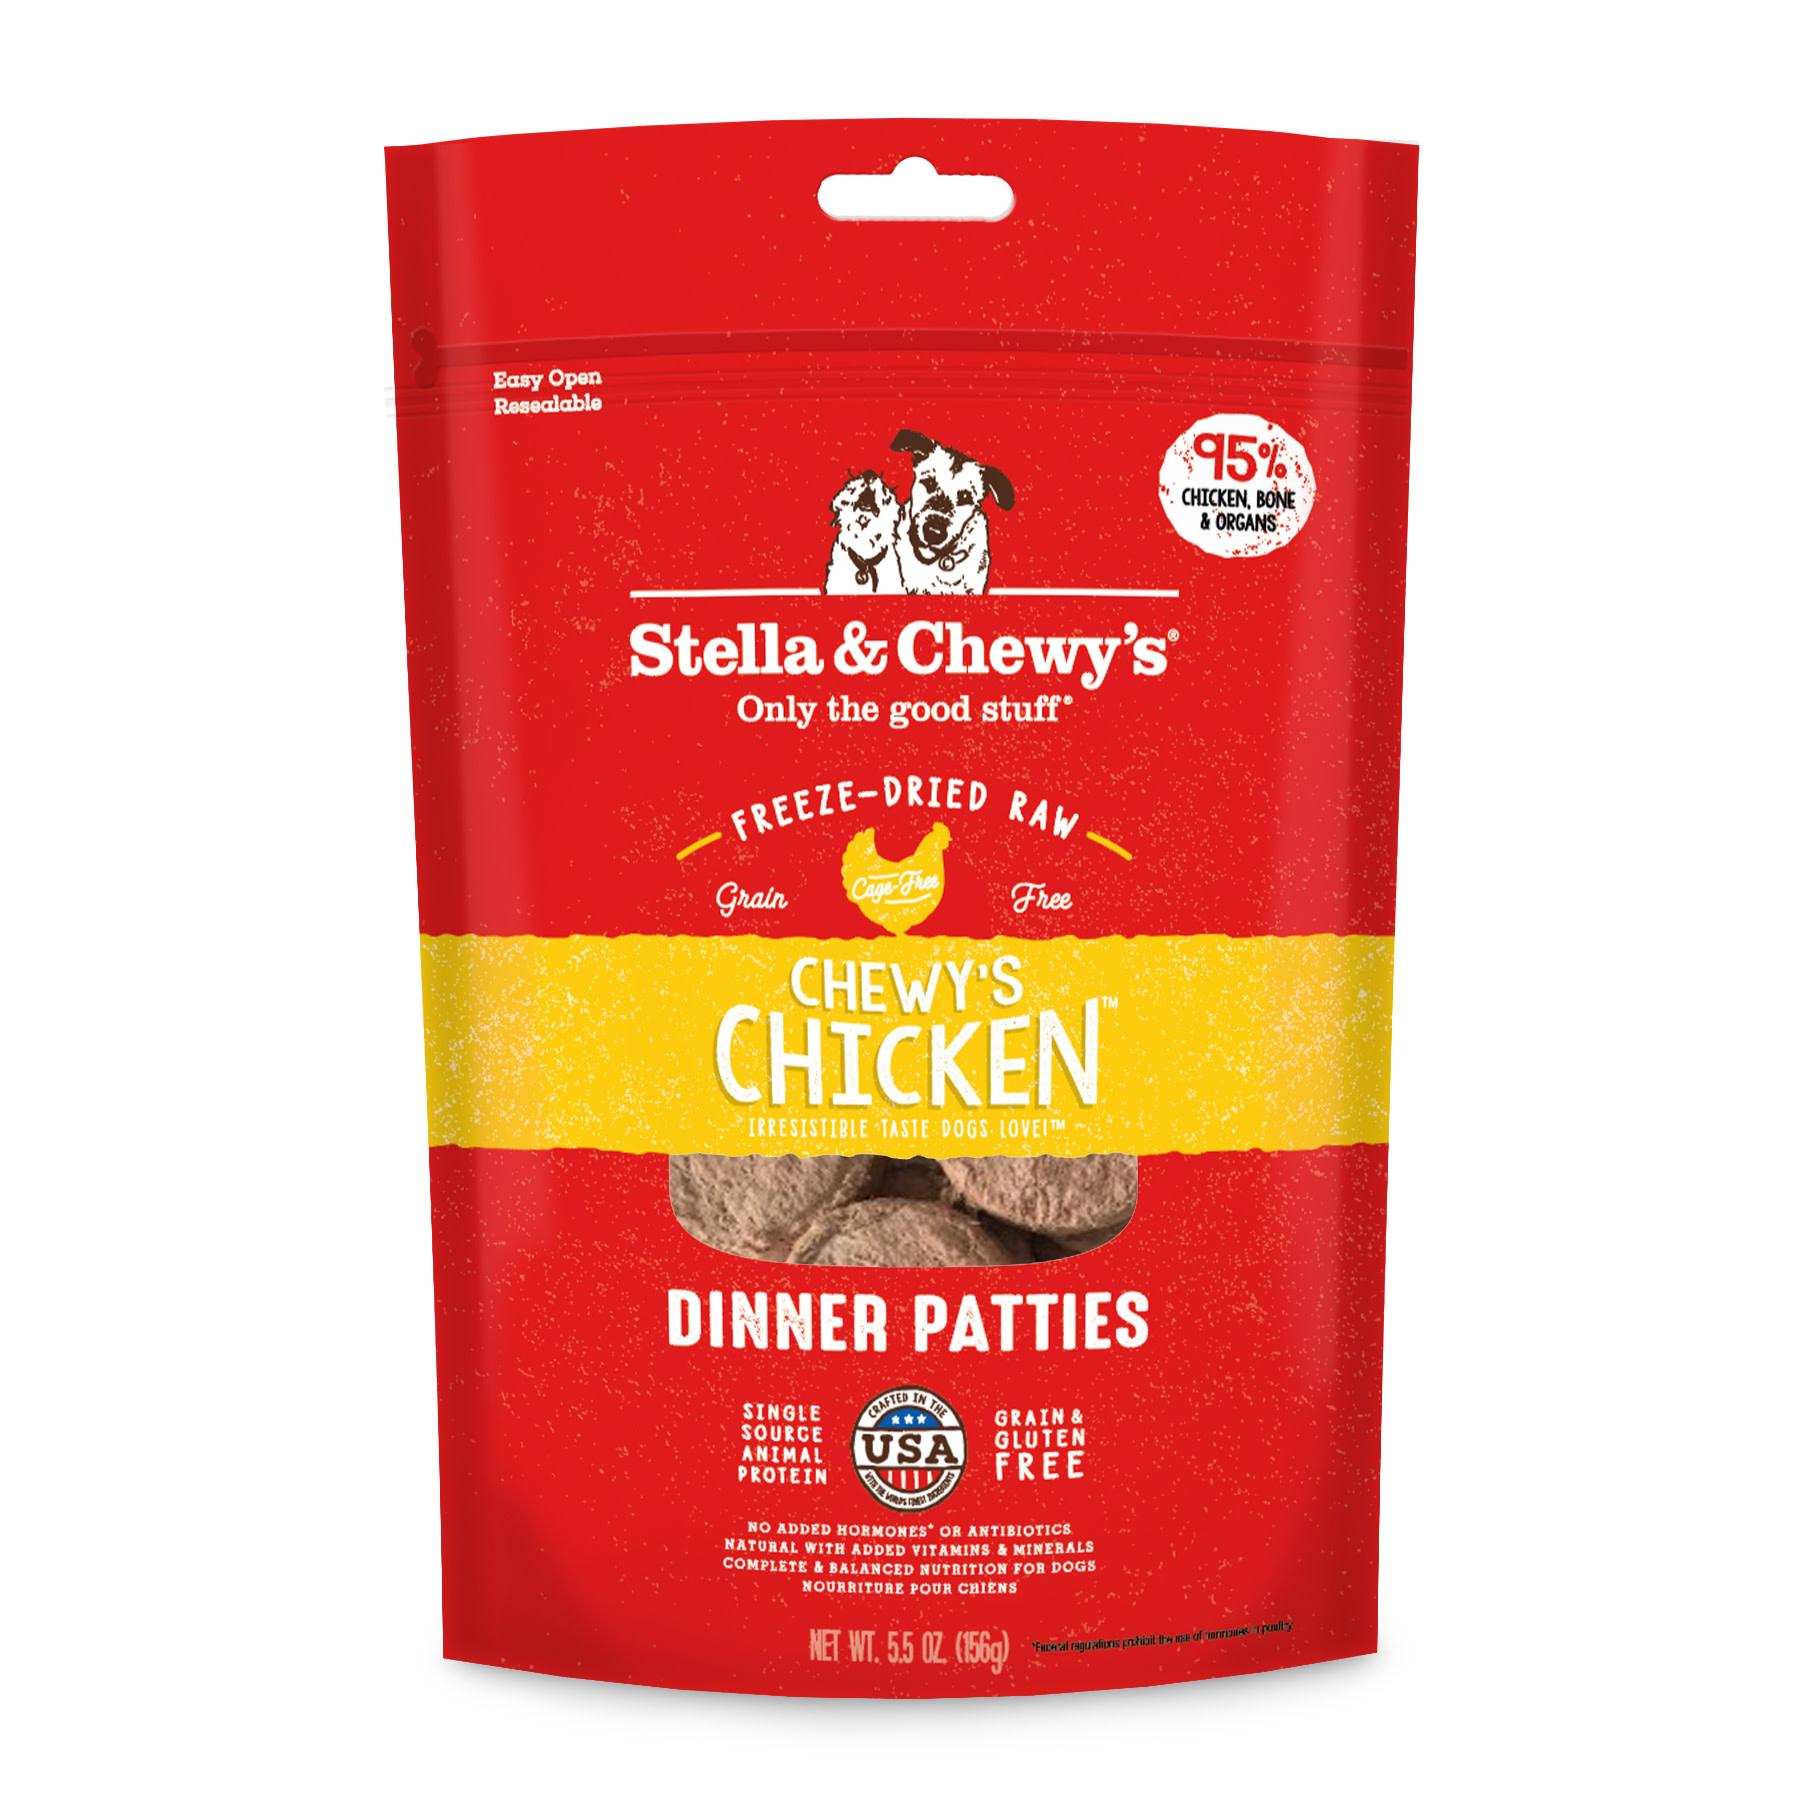 Chewy's Chicken Dinner Patties